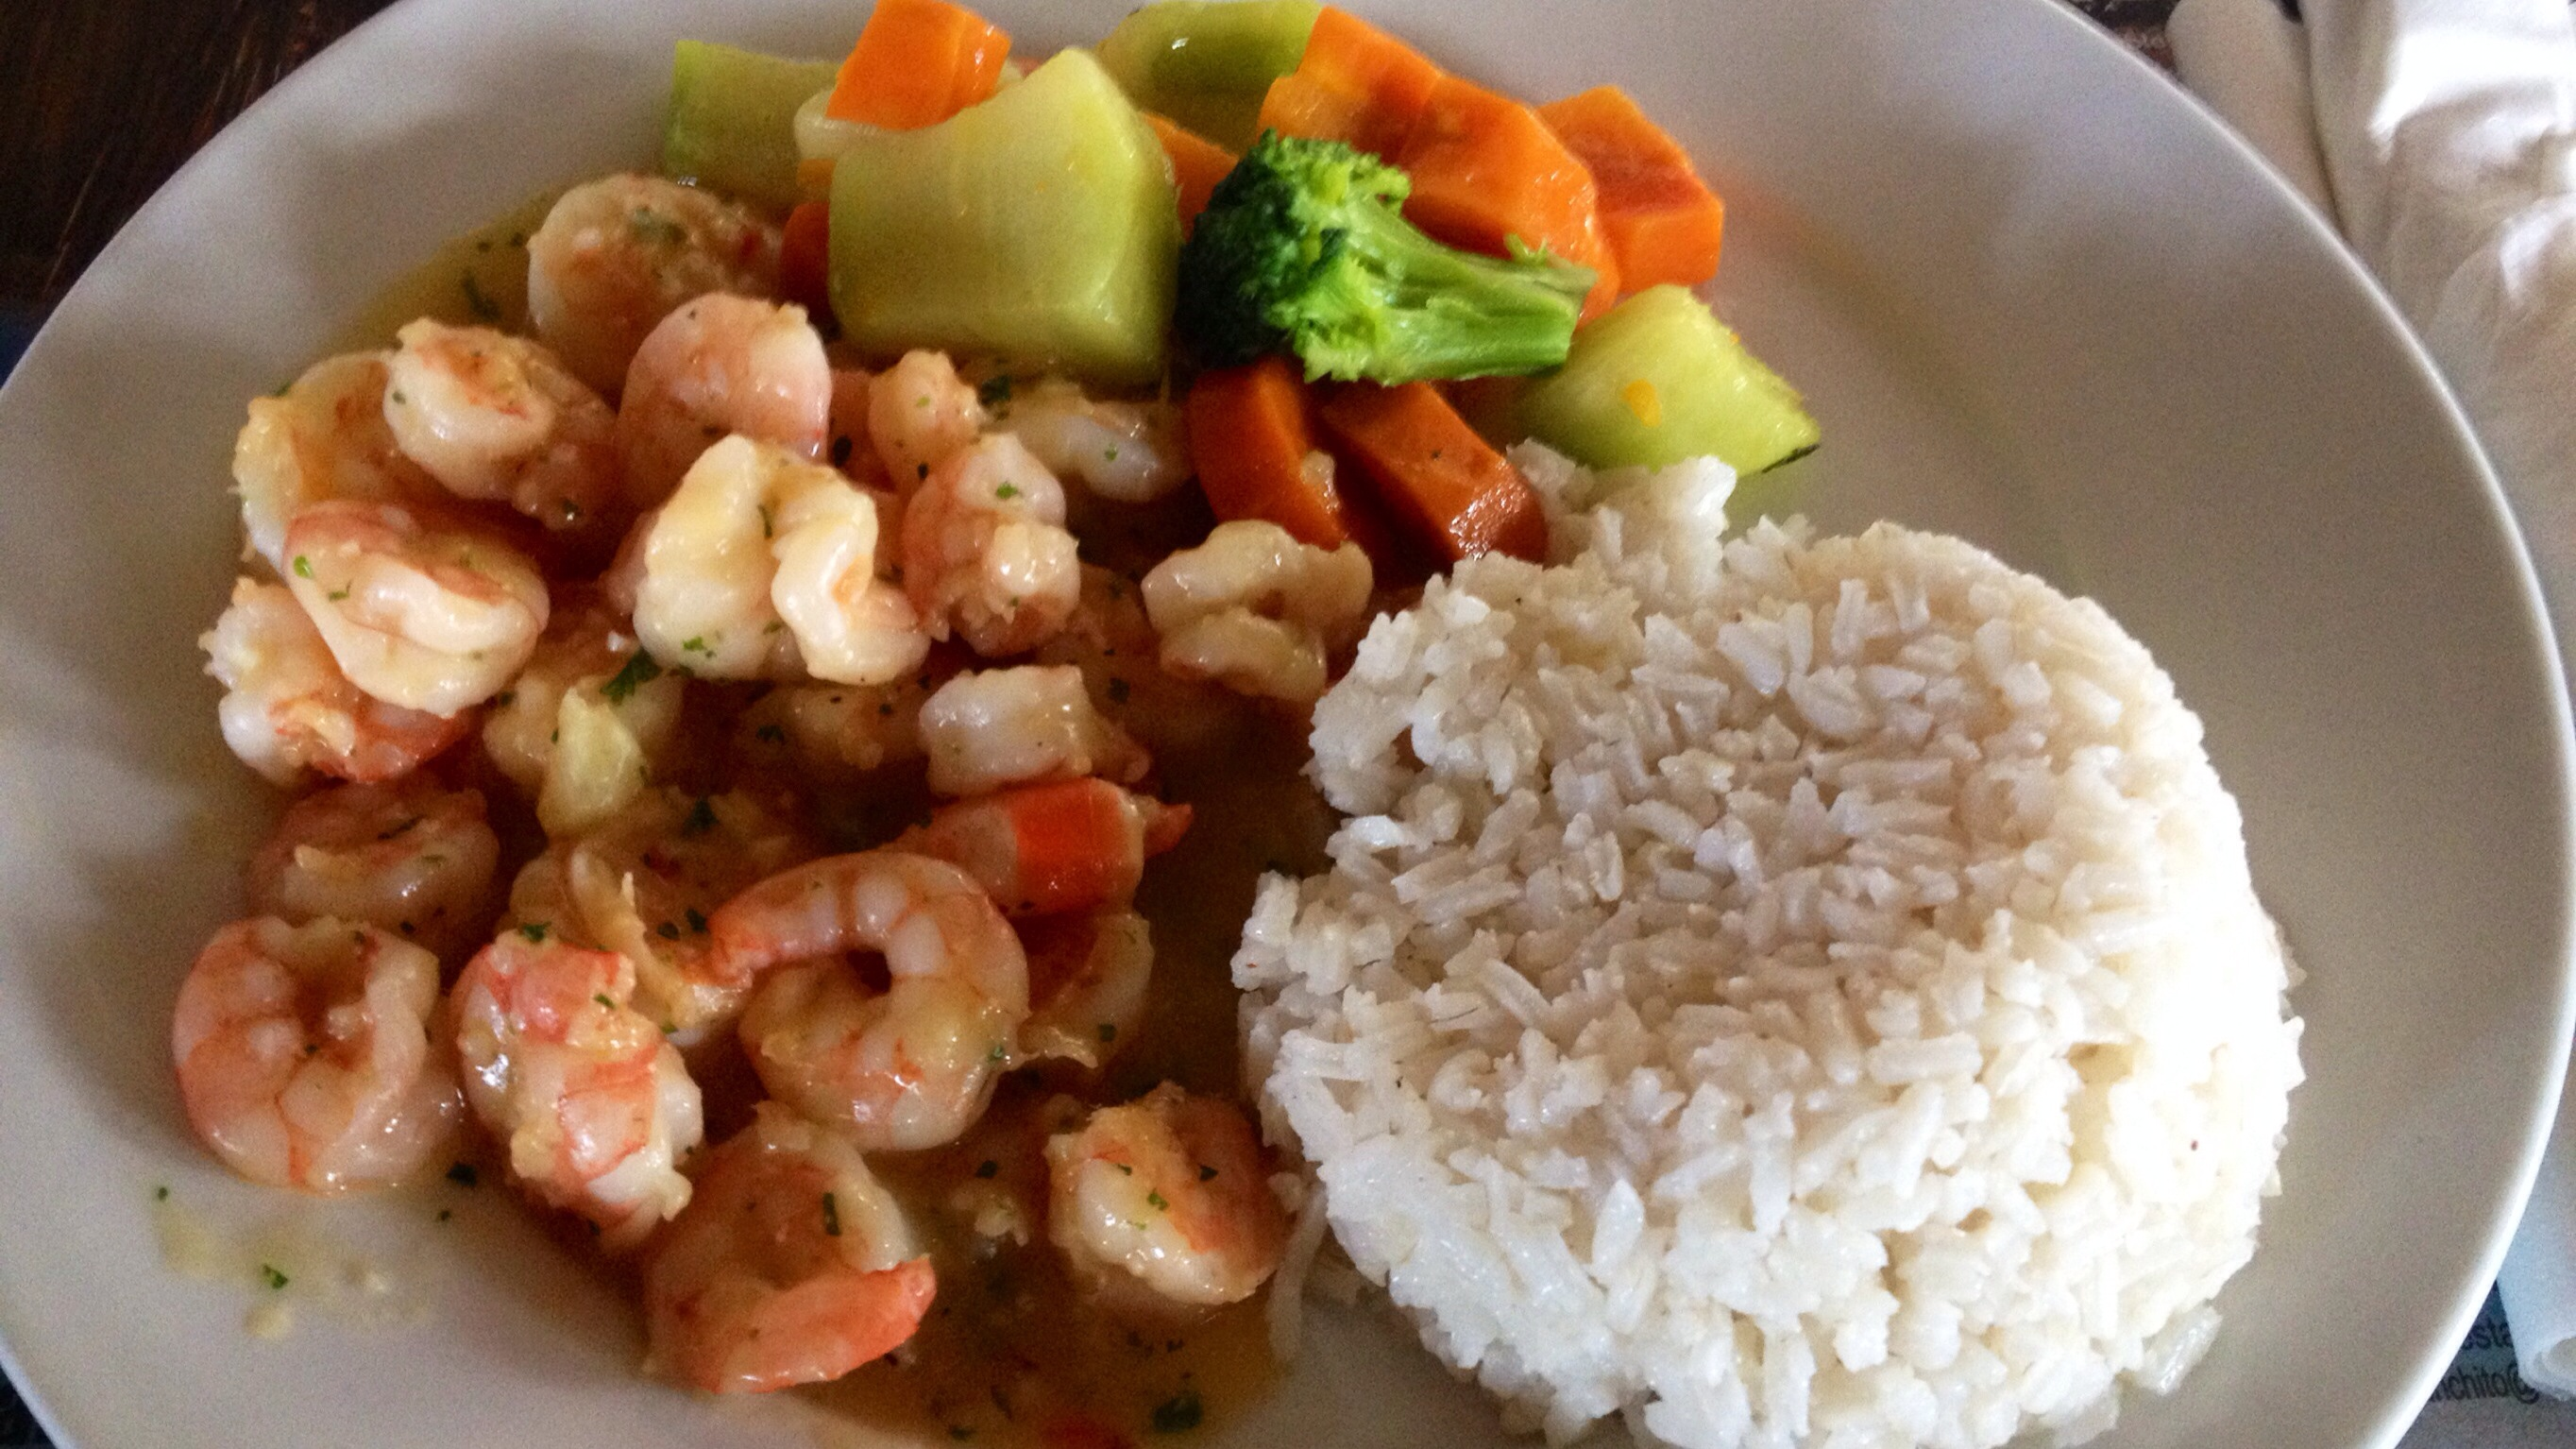 Camarones (Shrimps) mit Gemüse und Kokos-Reis